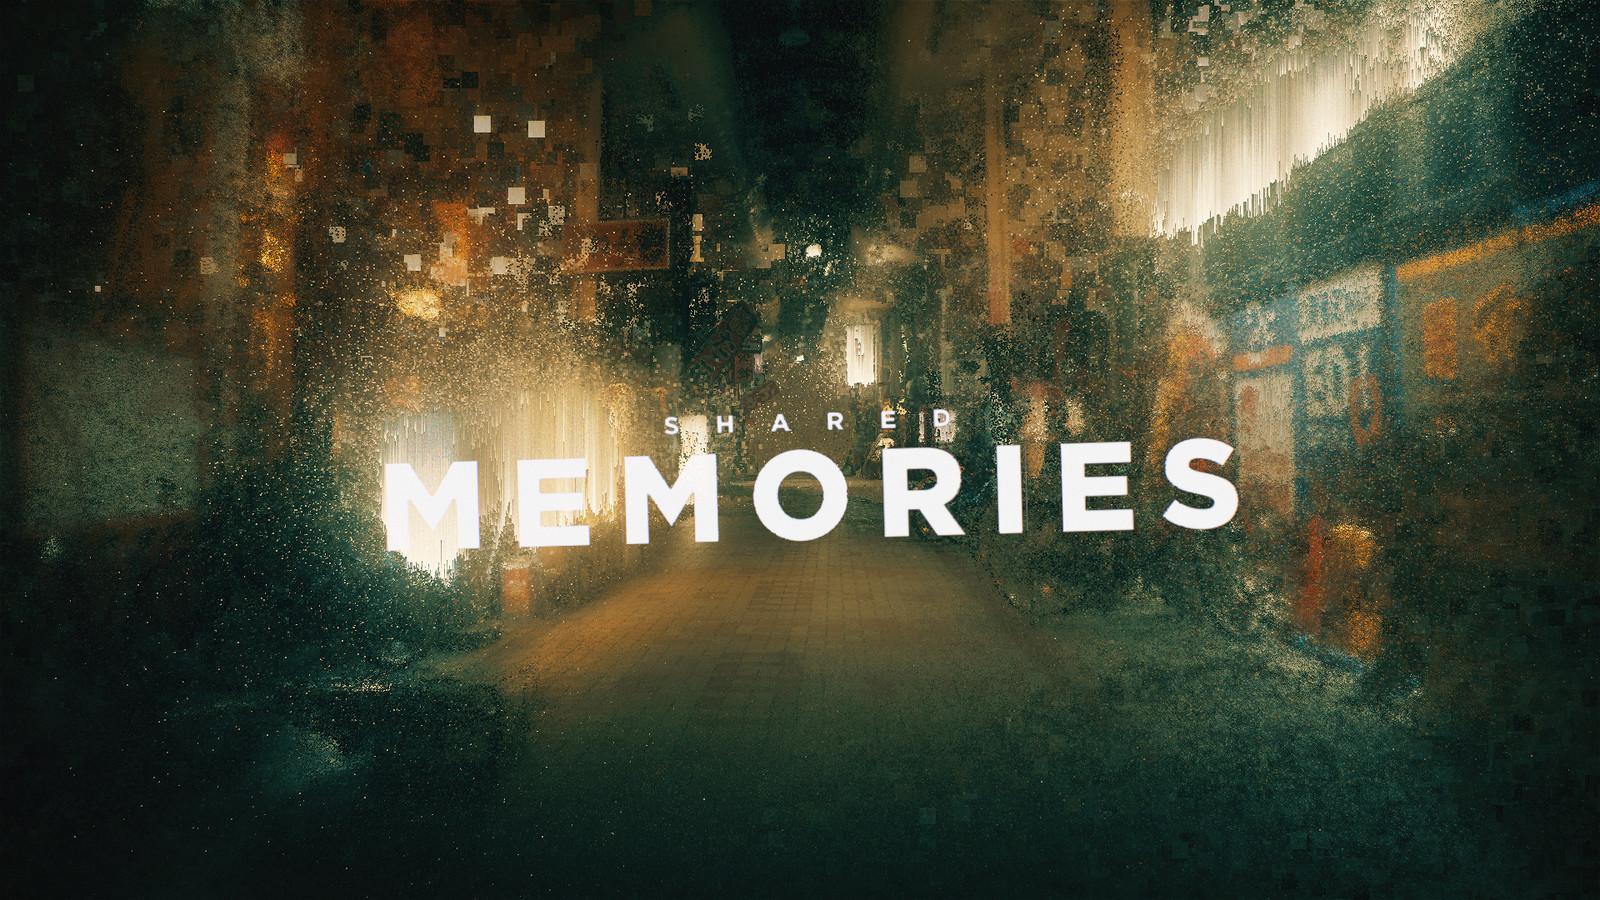 Shared Memories